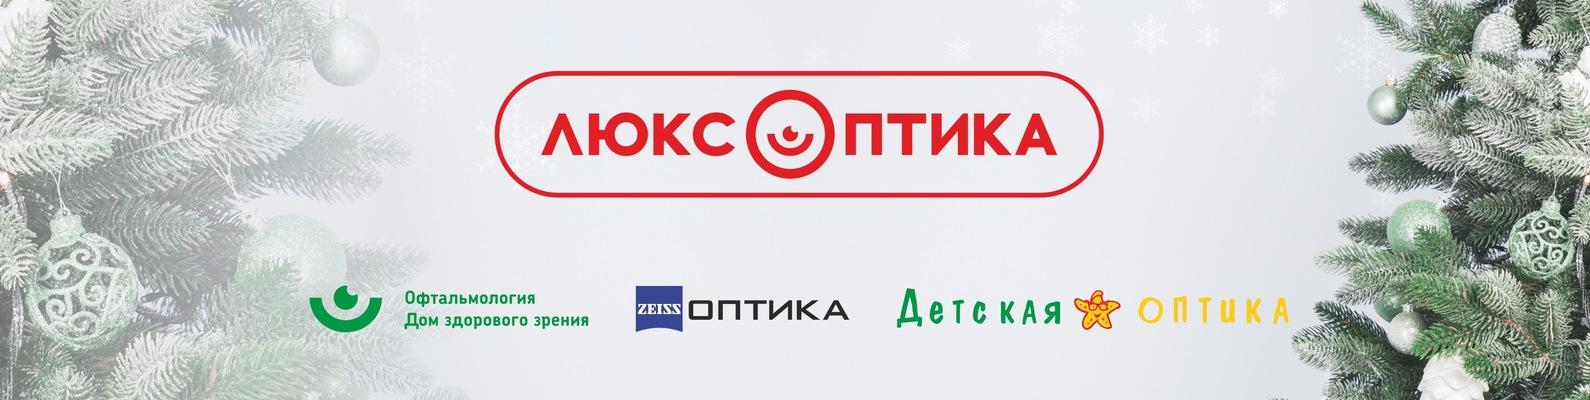 Люкс Оптика г. Киров   ВКонтакте a21530692db